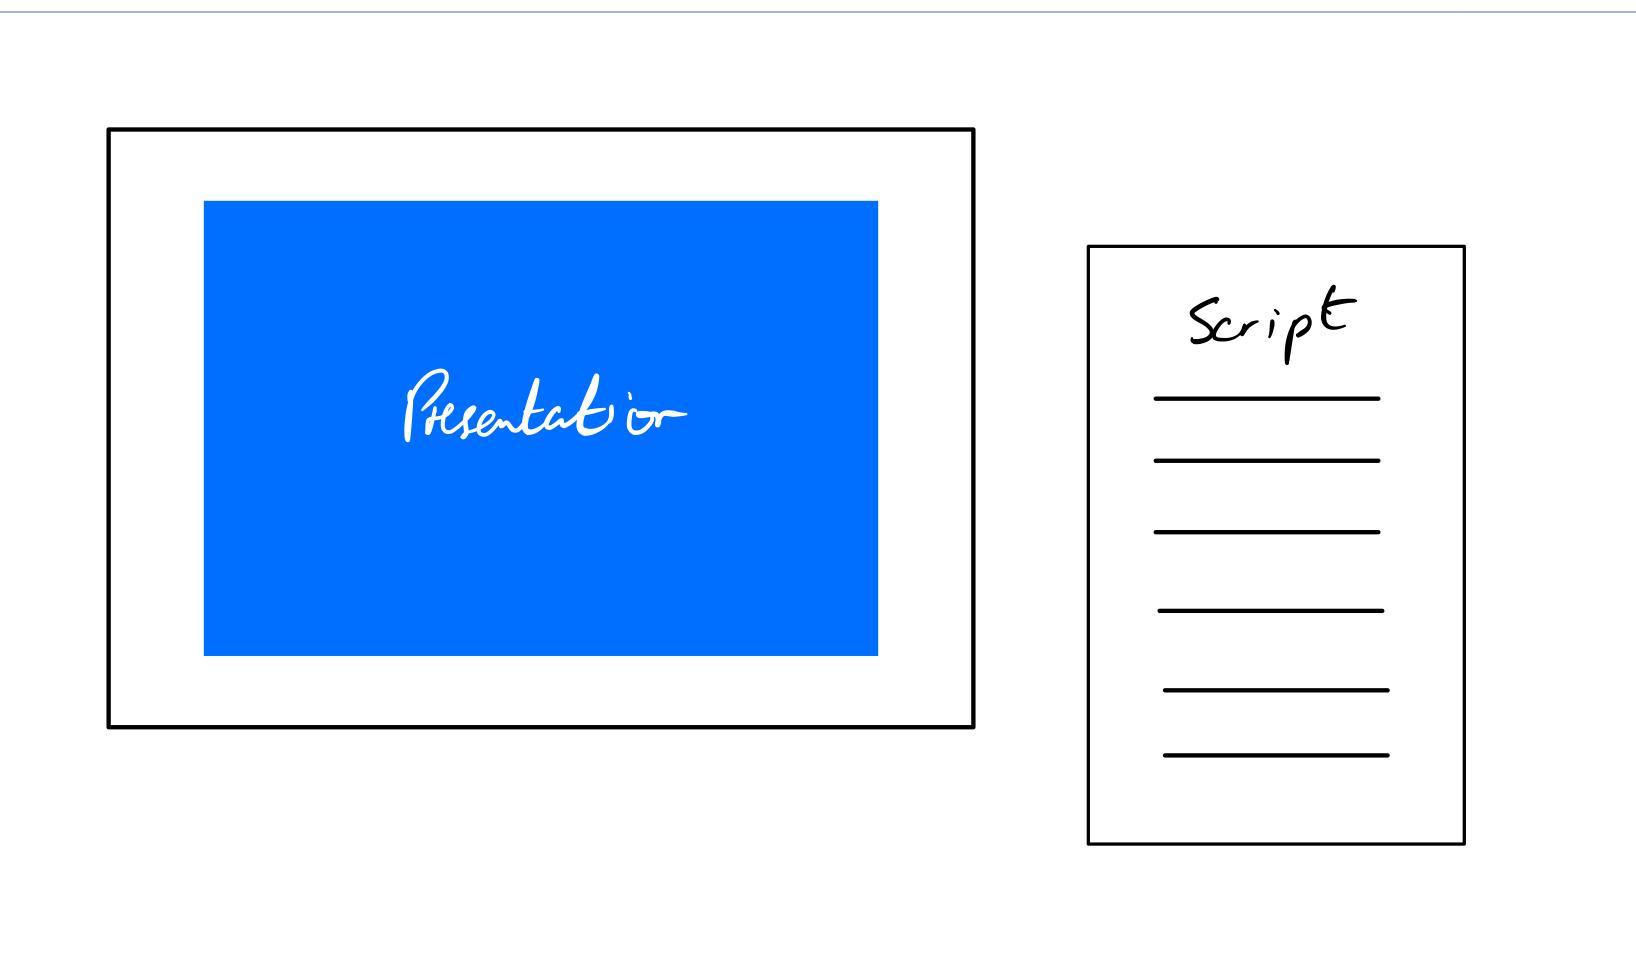 presentation vs a script when giving a presentation